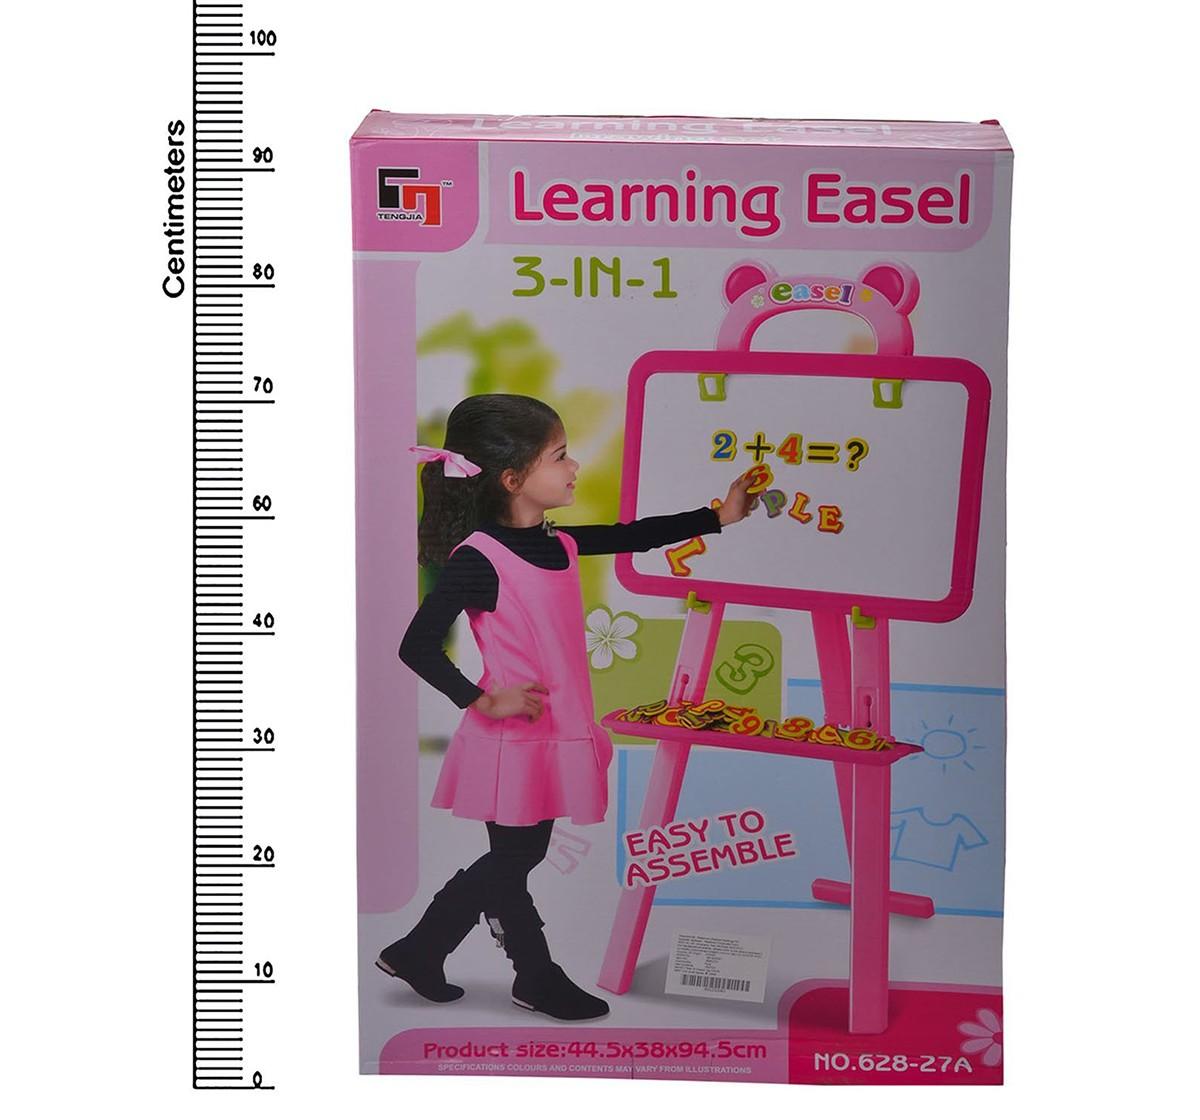 Comdaq Art Easel Activity Set for Kids age 3Y+